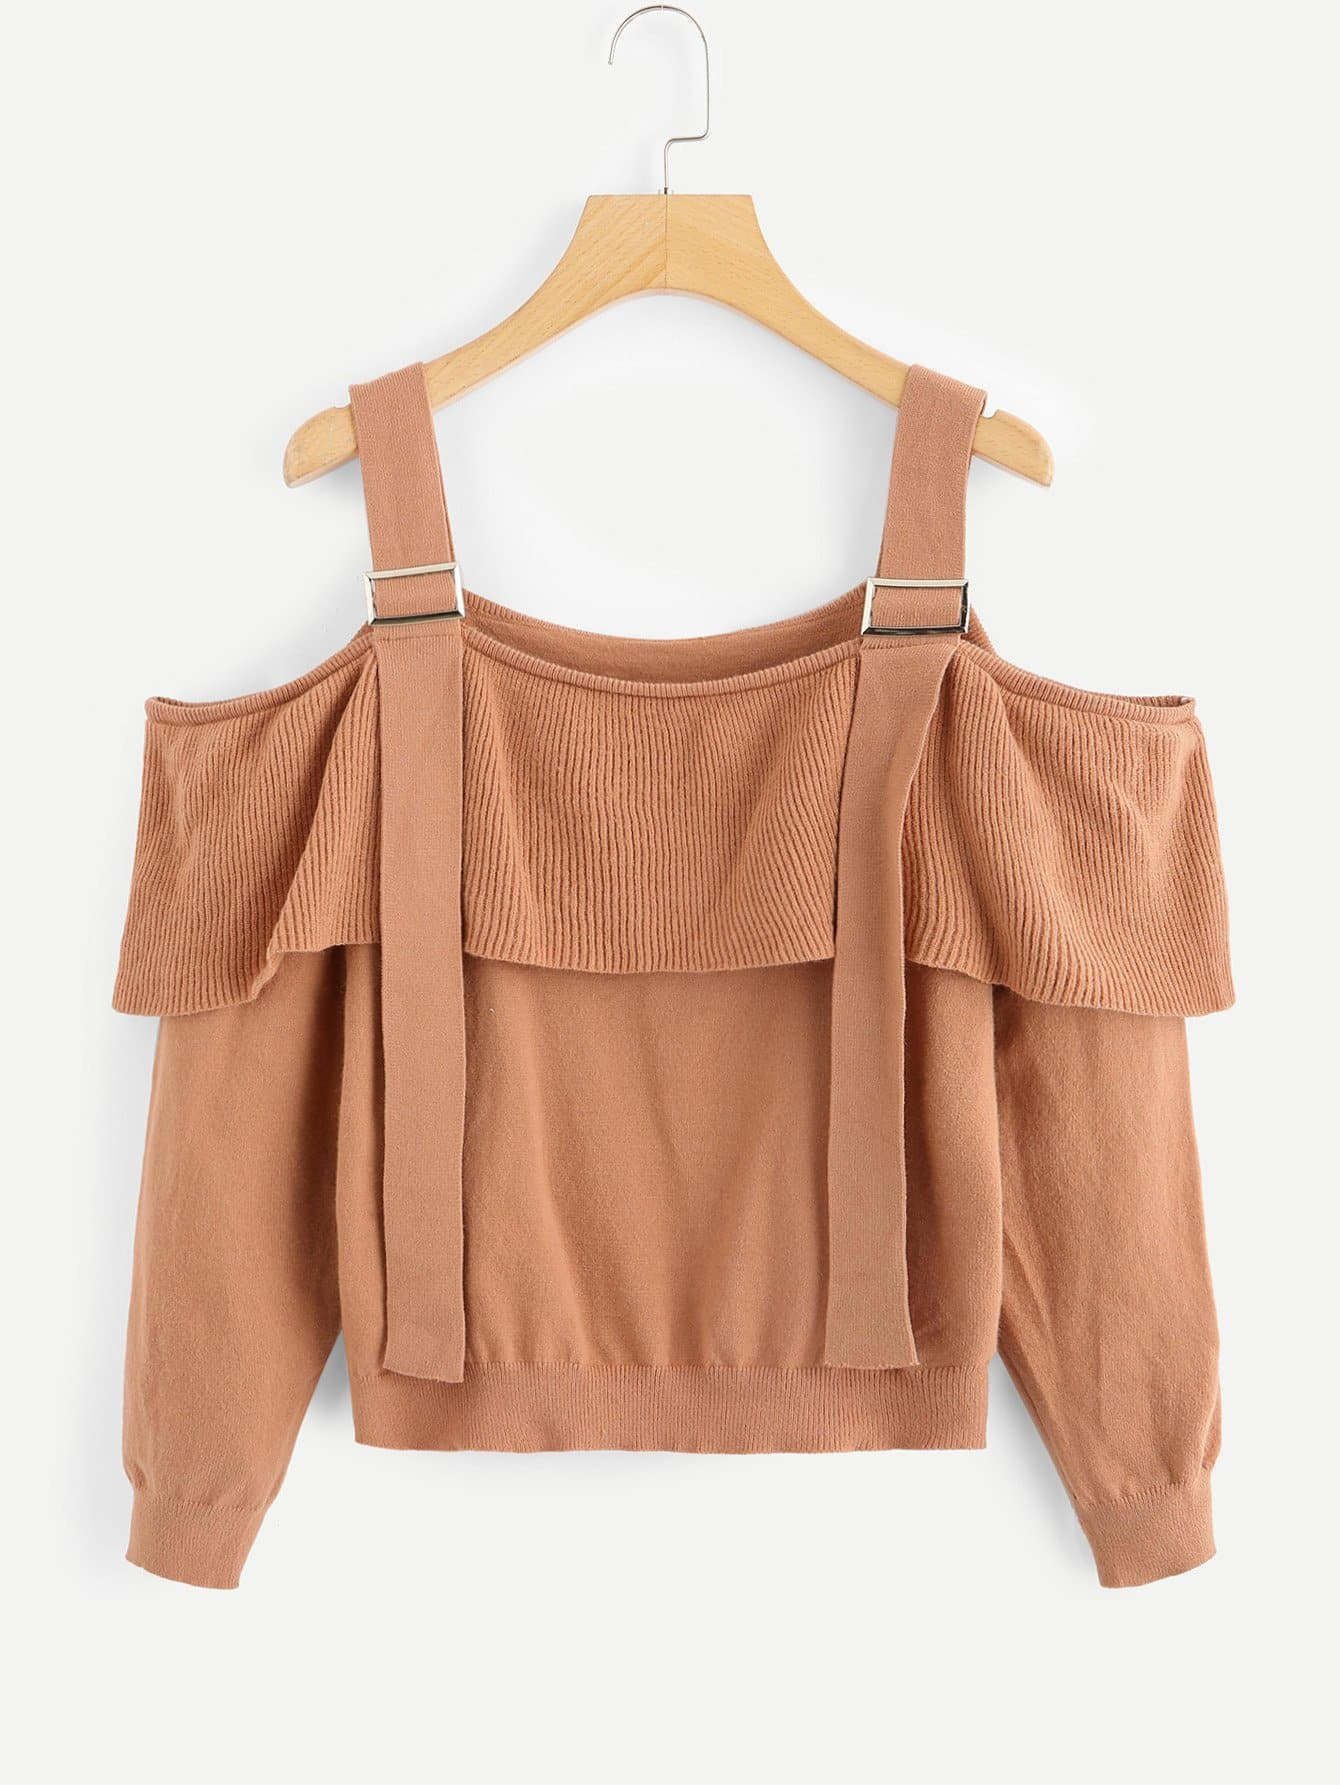 Ruffle Trim Solid Straps Sweater